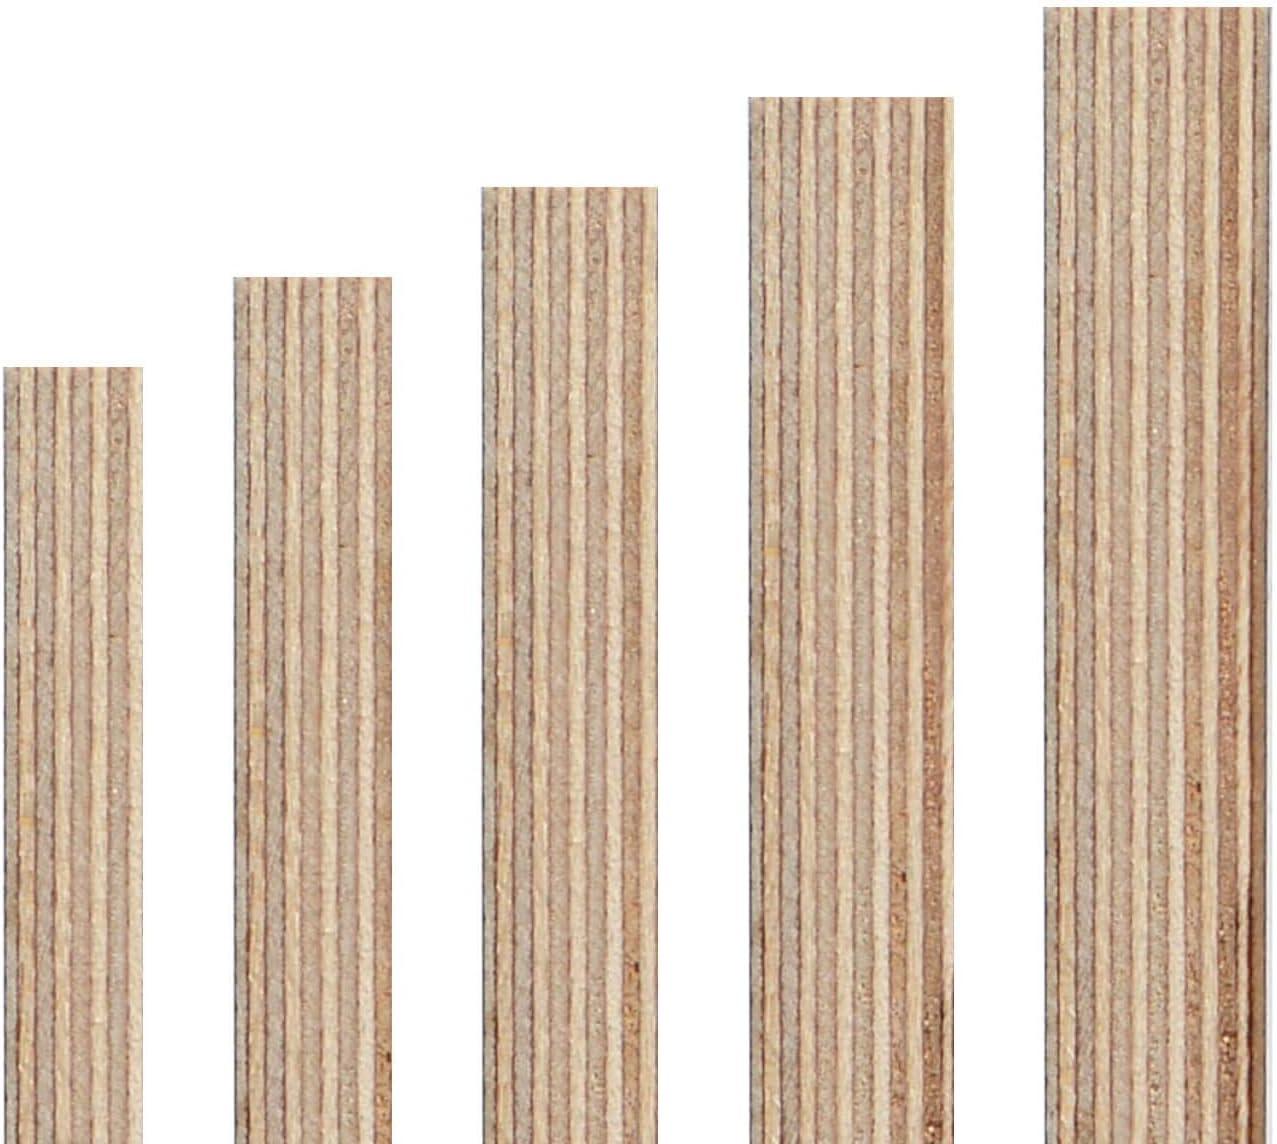 21mm Sperrgut Multiplex Zuschnitt Siebdruckplatten Multiplexplatten Zuschnitte Melaminbeschichtet Birke Bodenplatte Holz Braun Grau Breite 60 cm, L/änge 60 cm